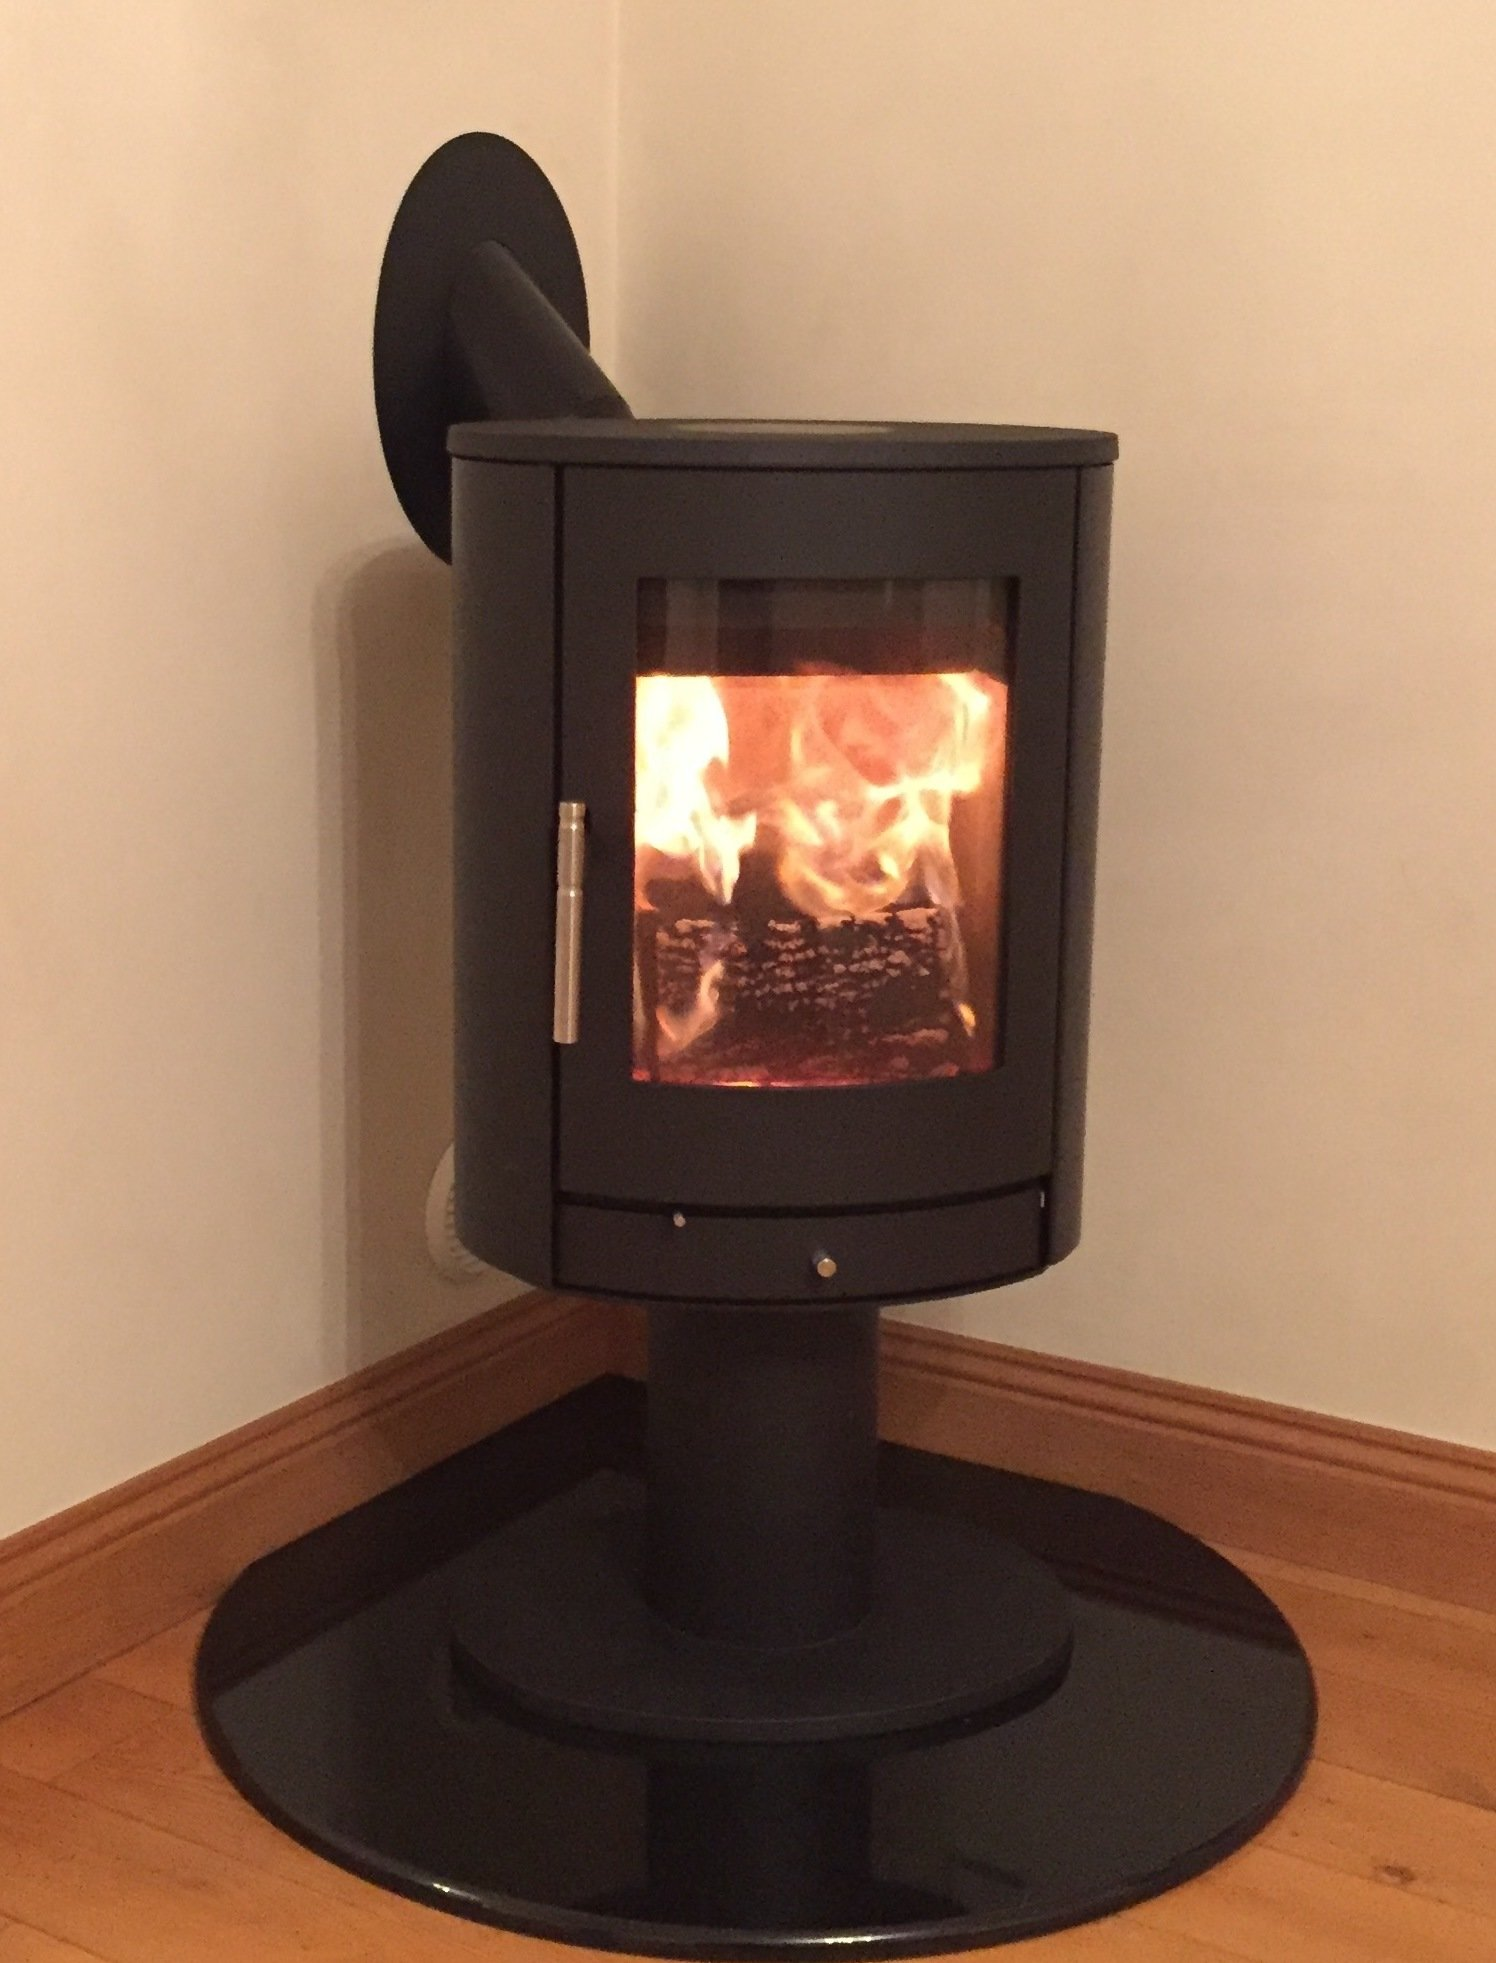 Heta Scan-line 850 Pedestal 2 - 8kw. Danish quality and style